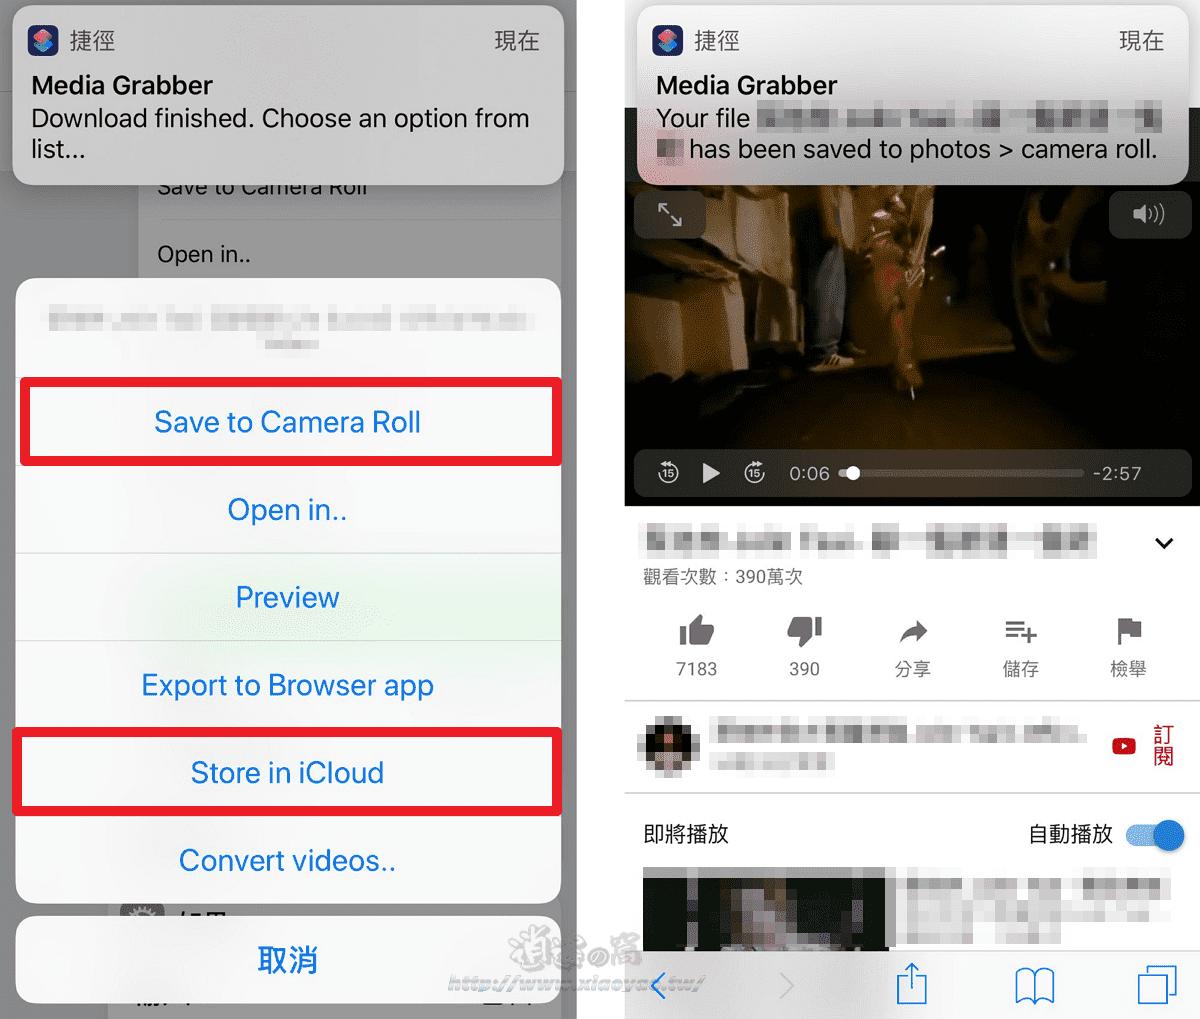 Media Grabber 捷徑腳本下載網路影片、音樂